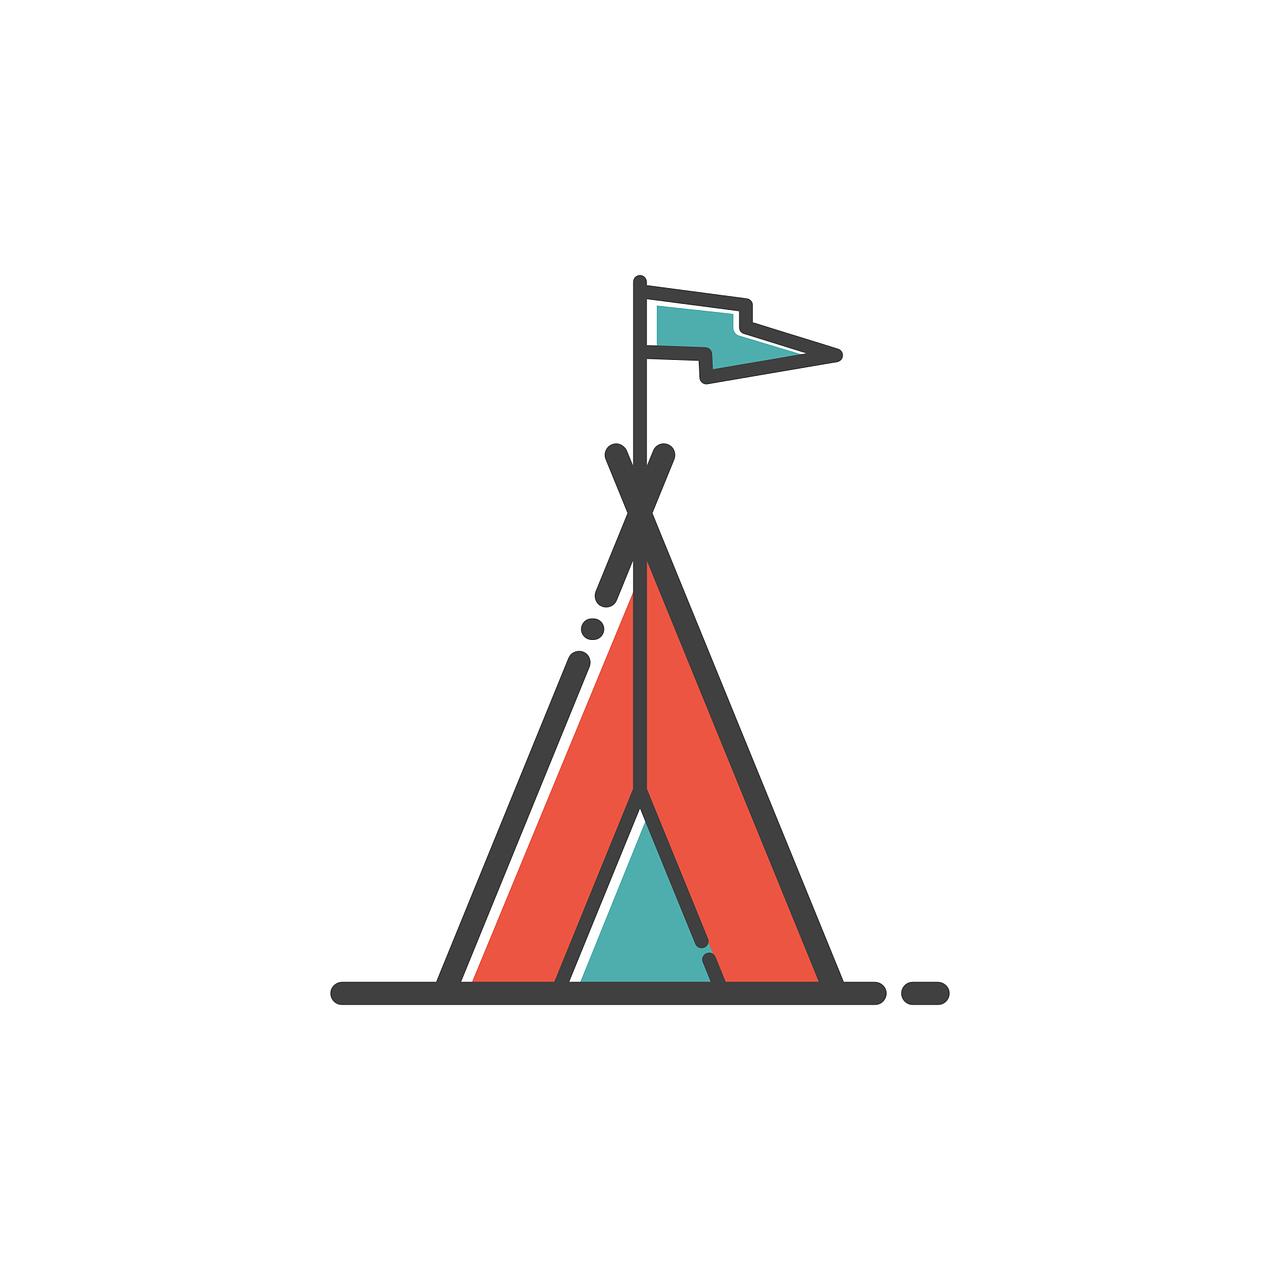 a frame tent